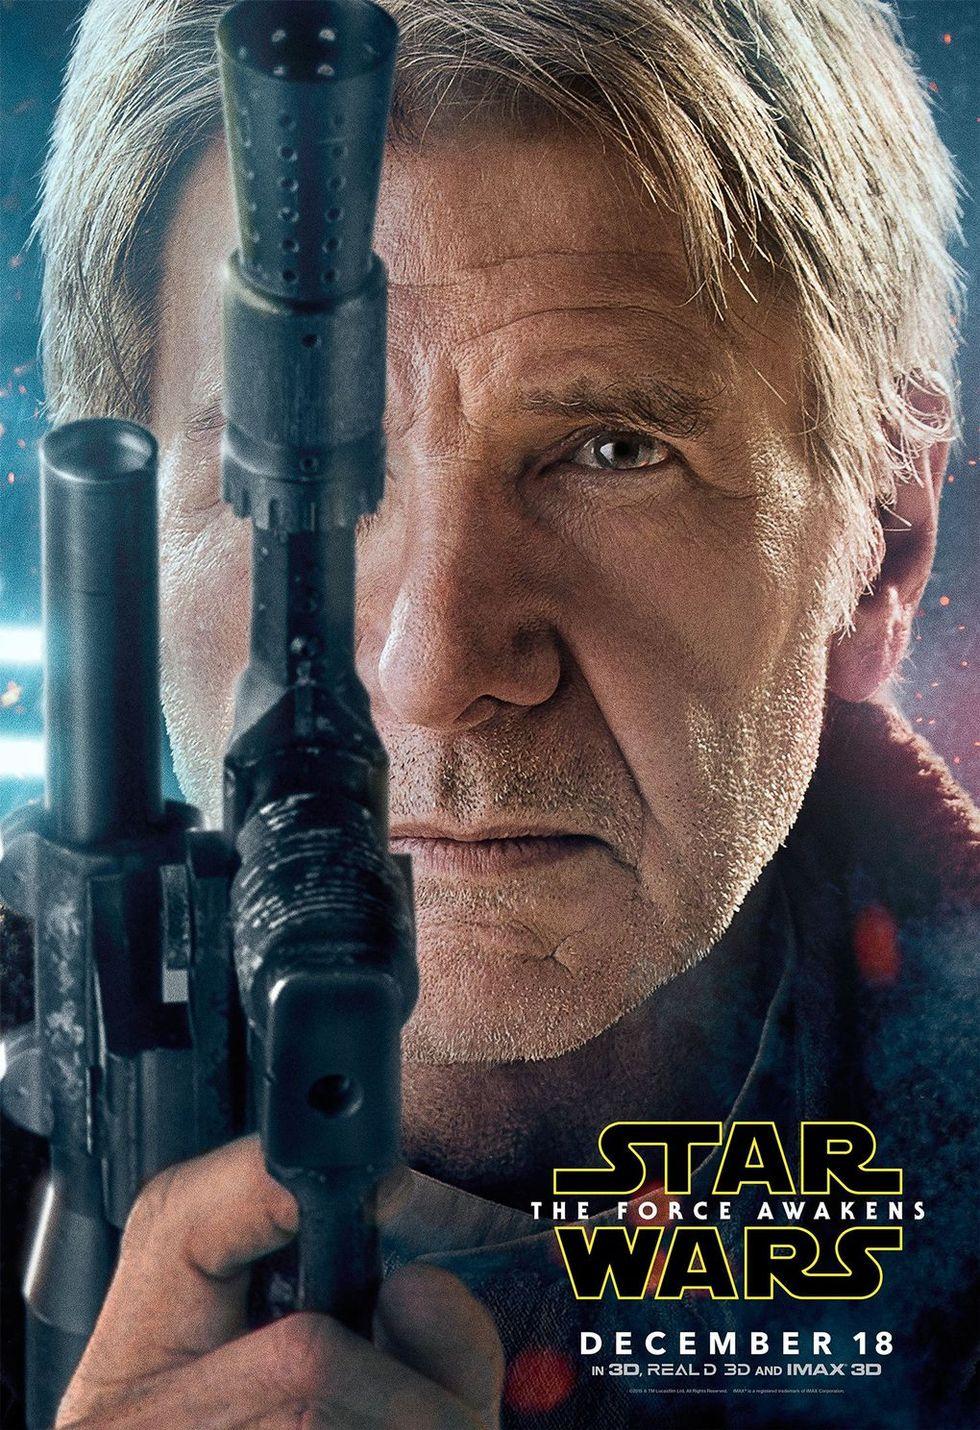 Nya affischer för Star Wars: The Force Awakens